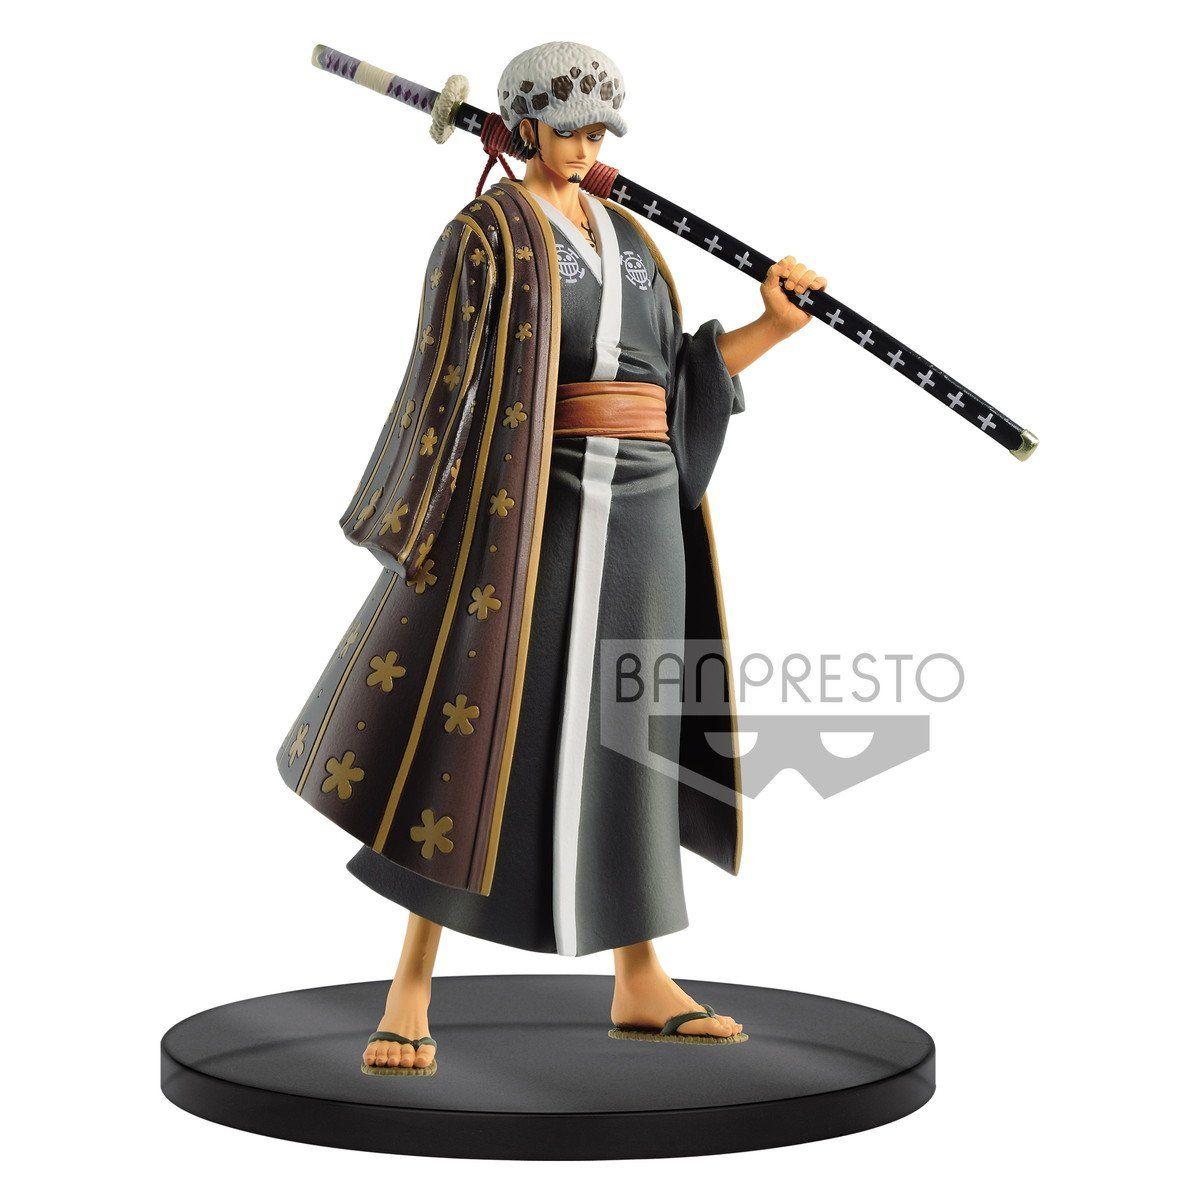 "Banpresto One Piece 6.7/"" Buggy DXF Figure The Grandline Men Volume 7"